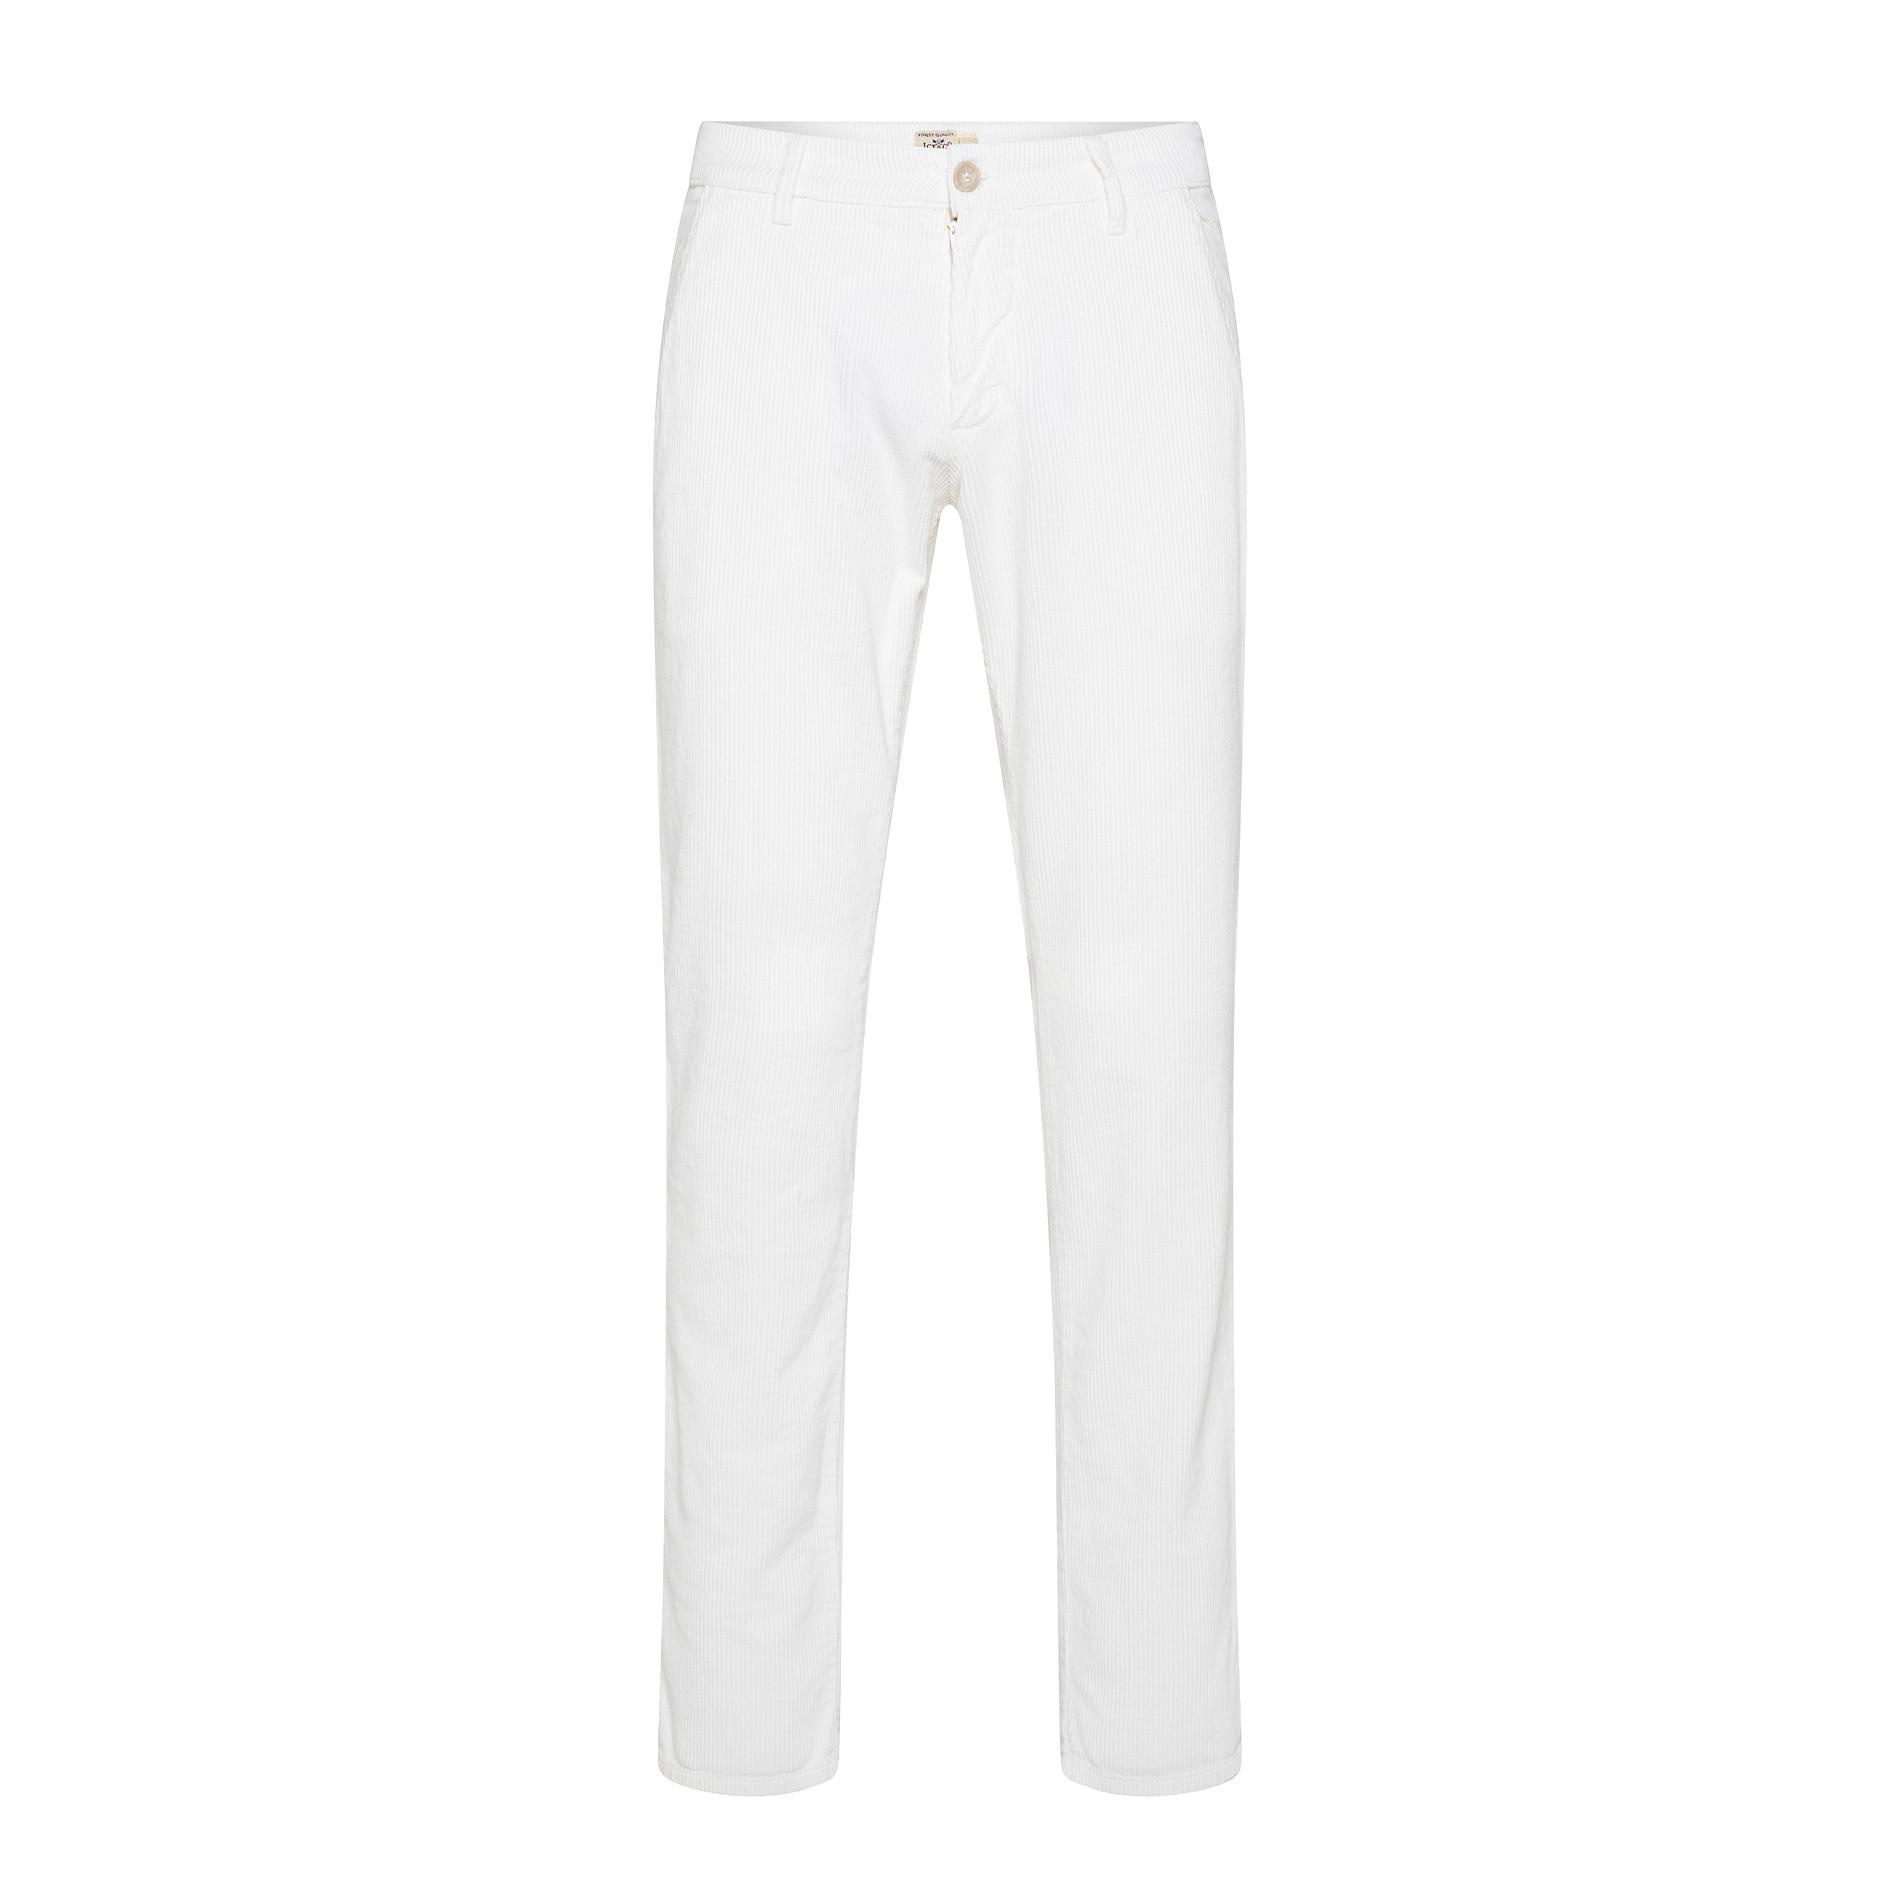 Pantaloni chino velluto stretch, Bianco, large image number 0